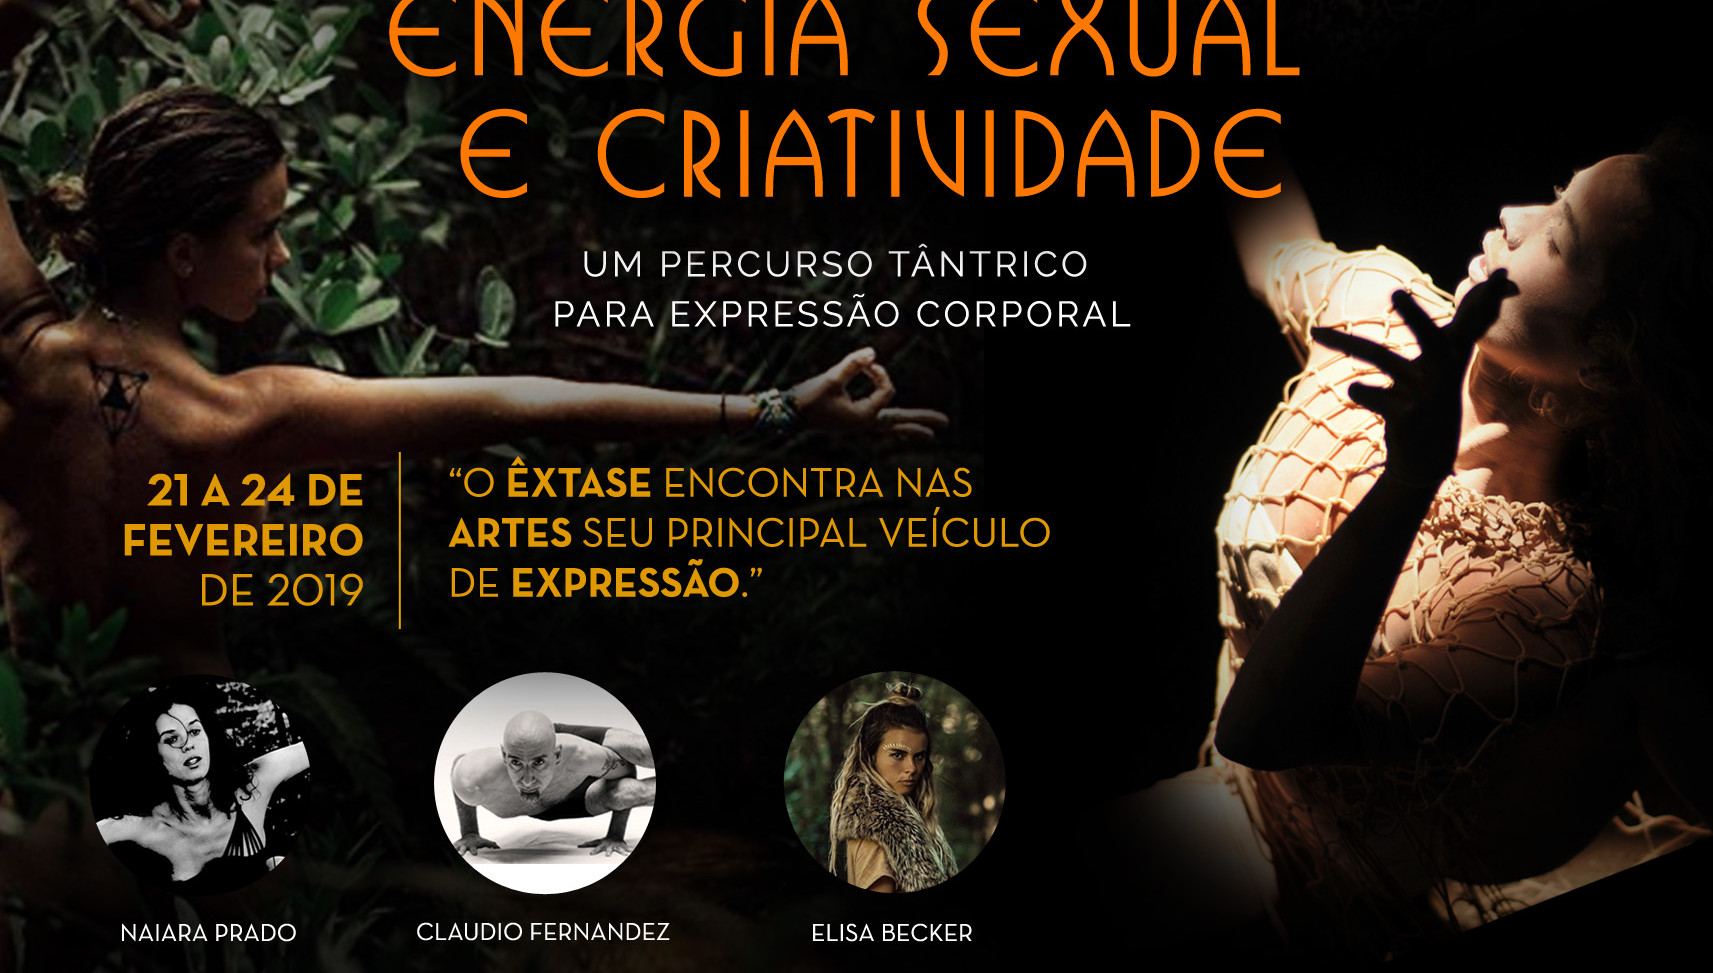 Energia Sexual e Criatividade 2019 2 cop